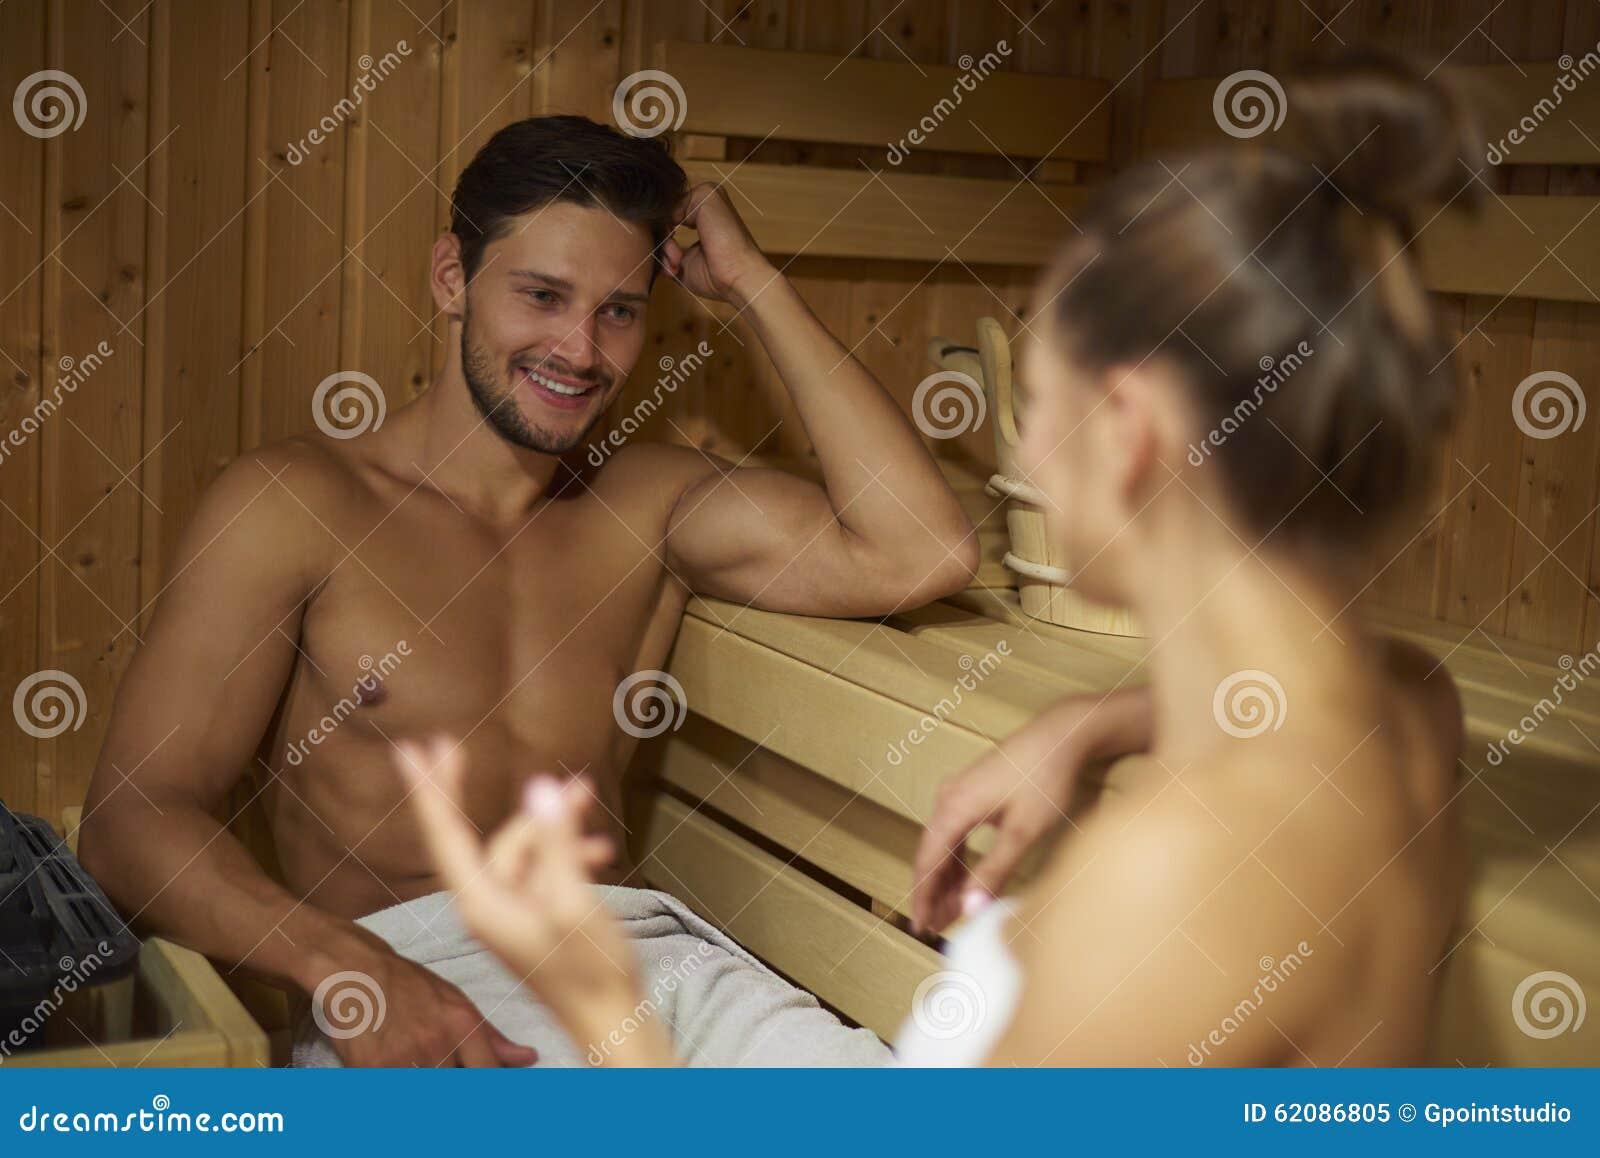 Футболисты в сауне, Жена Глушакова: Застала Дениса в бане с любовницей 28 фотография